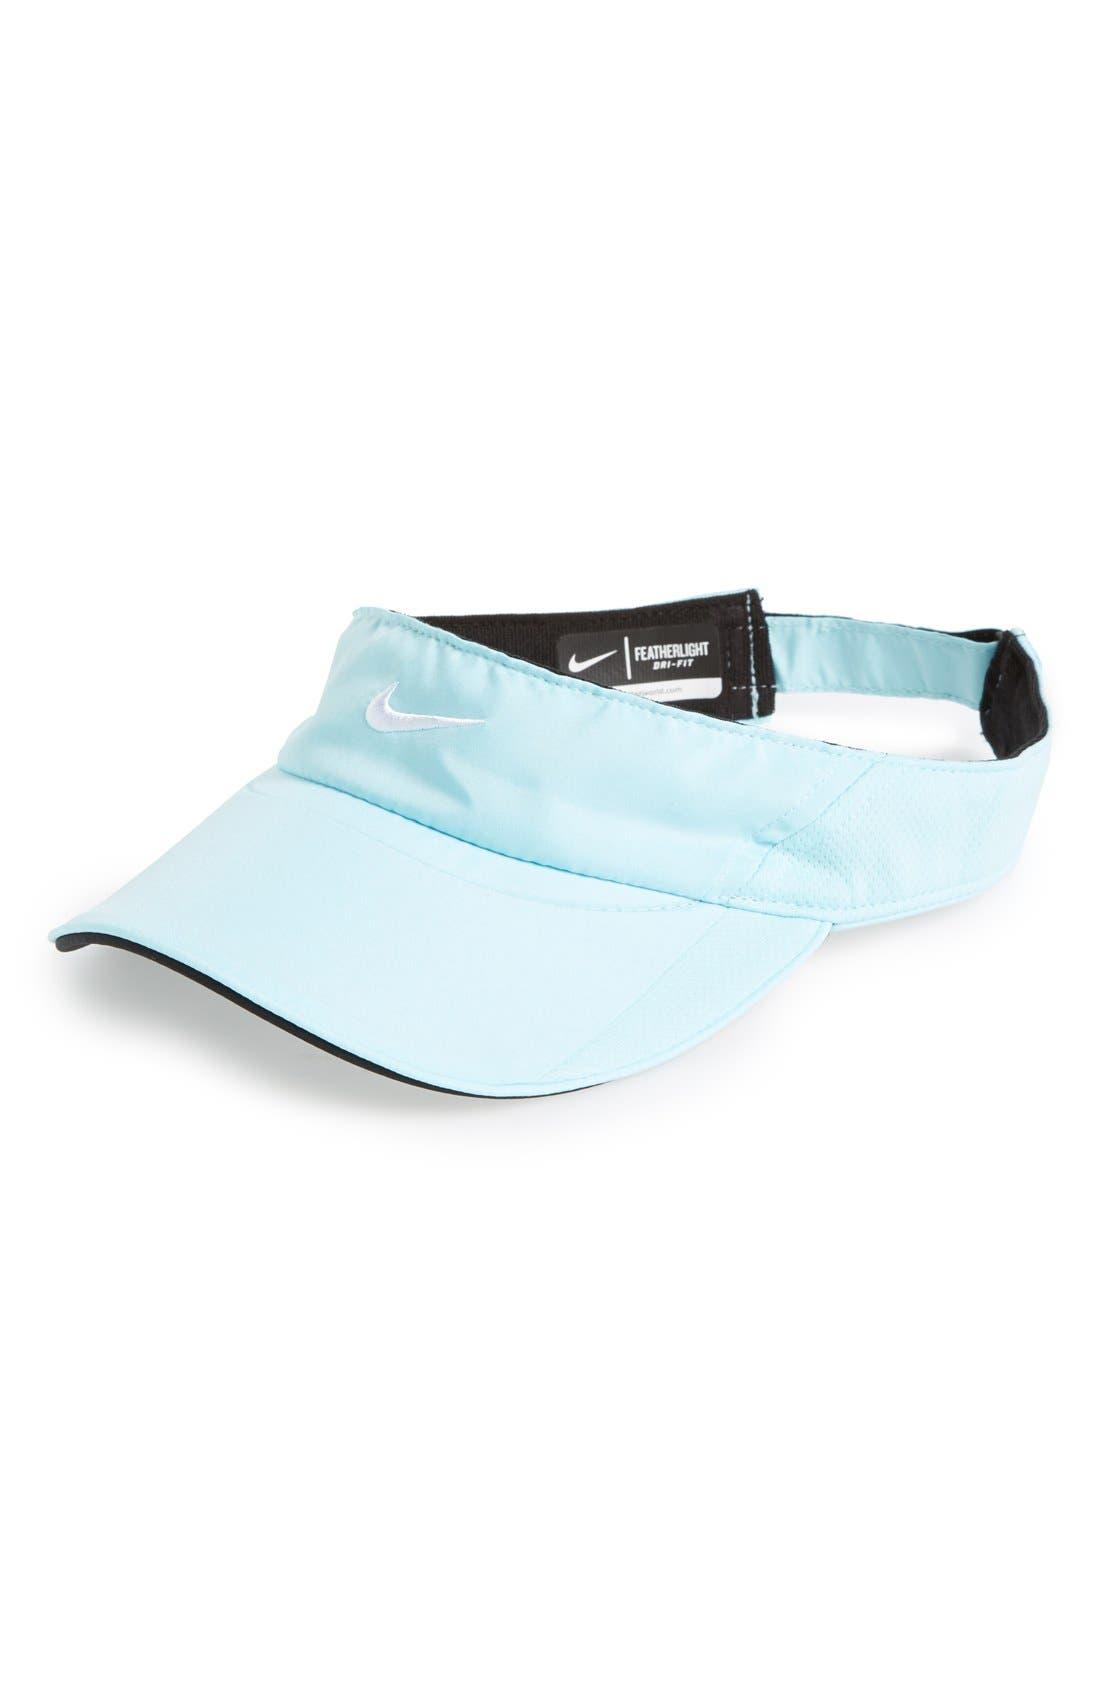 Main Image - Nike Dri-FIT Sport Visor